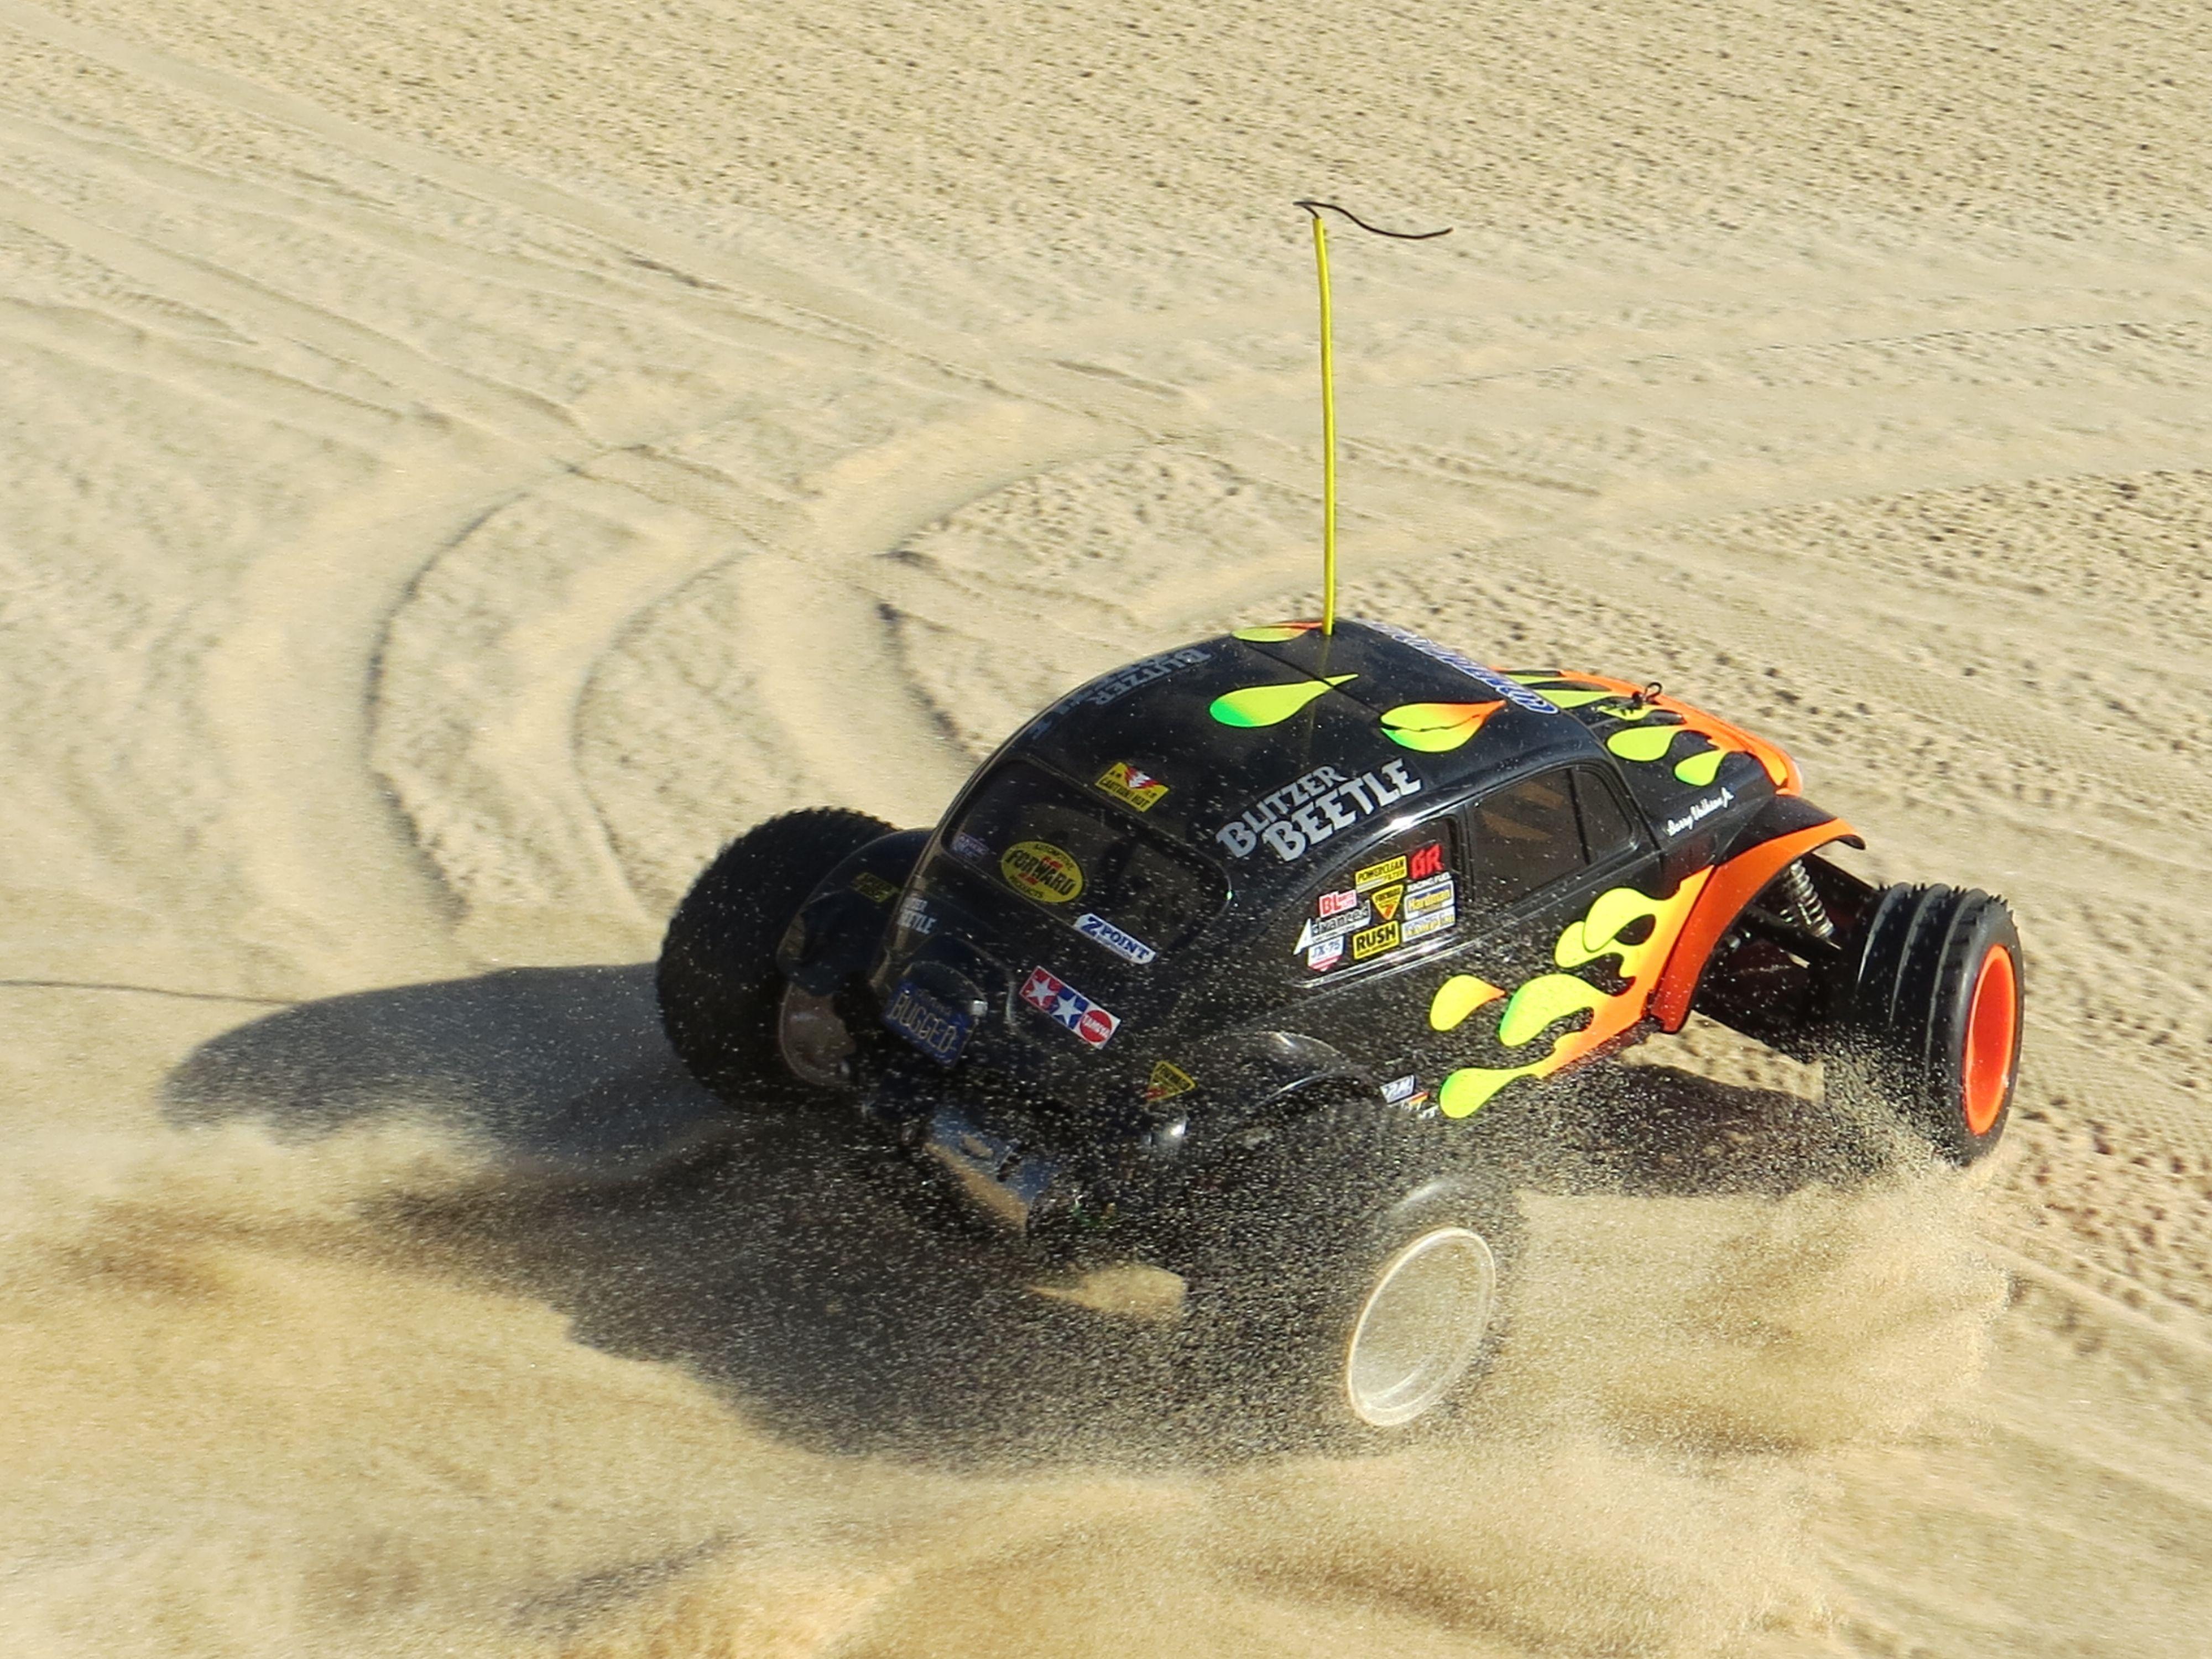 Tamiya Blitzer Beetle kicking up sand on the beach Radio